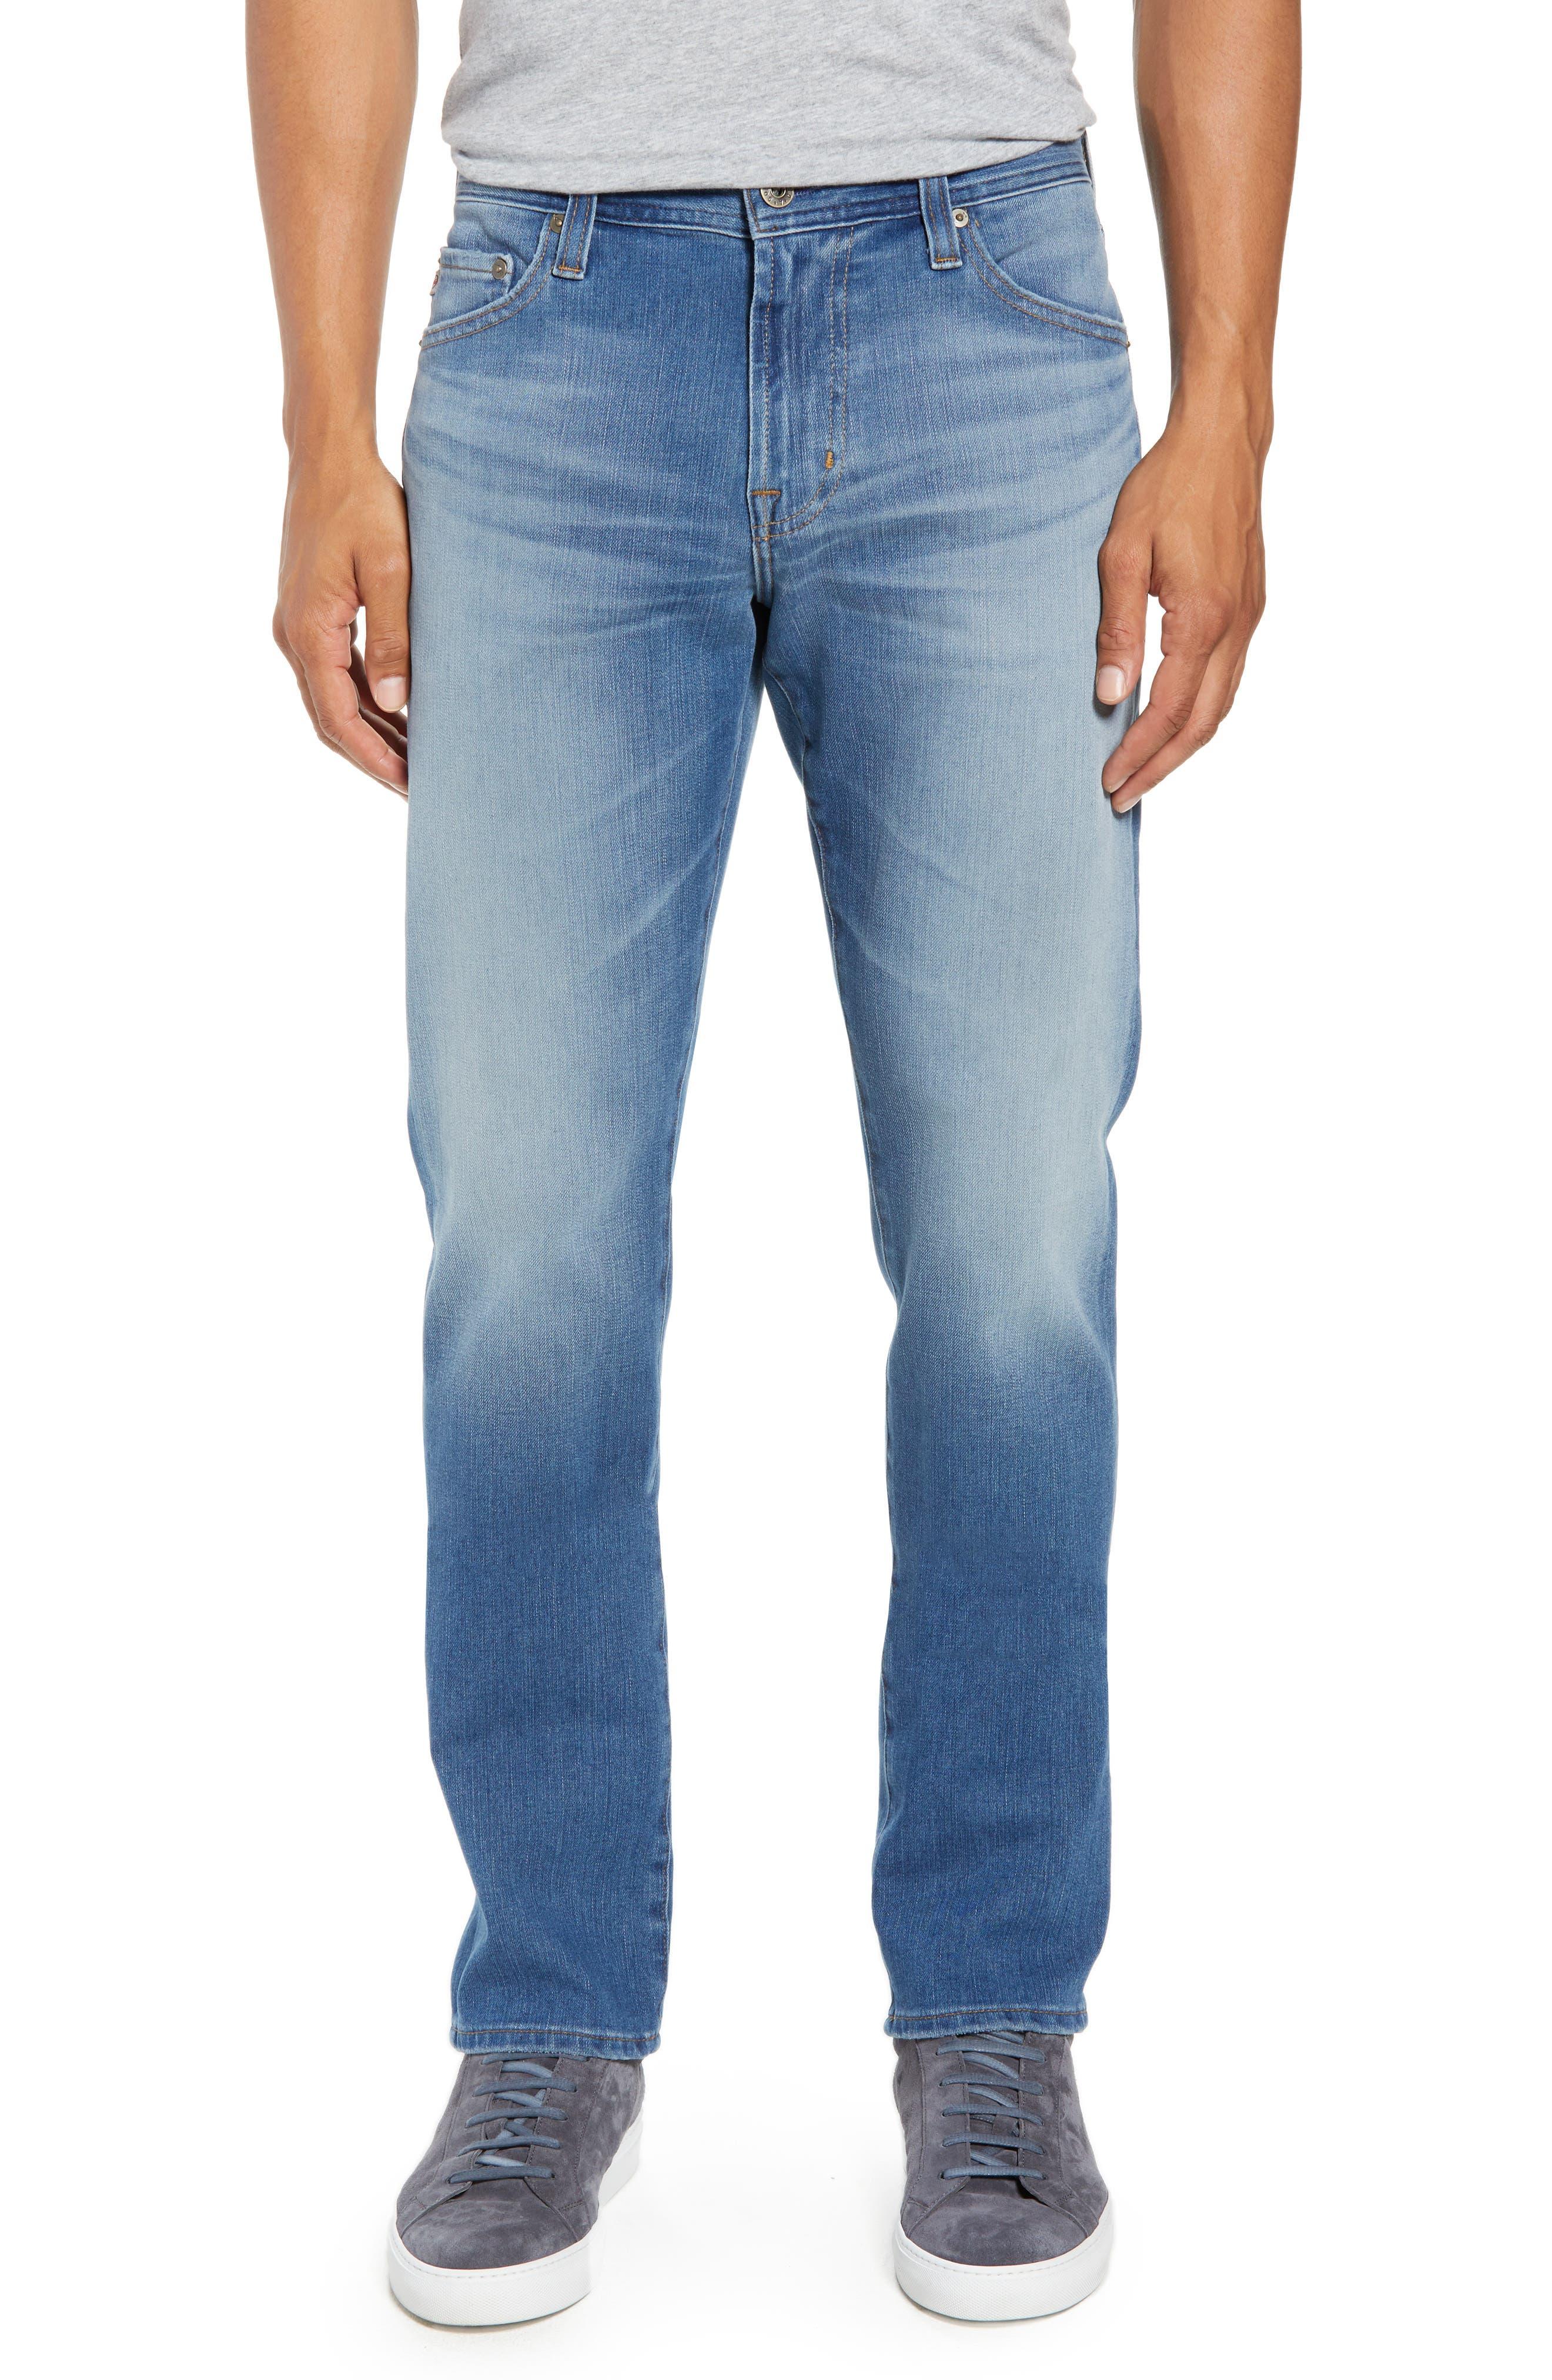 Everett Slim Straight Leg Jeans,                             Main thumbnail 1, color,                             487